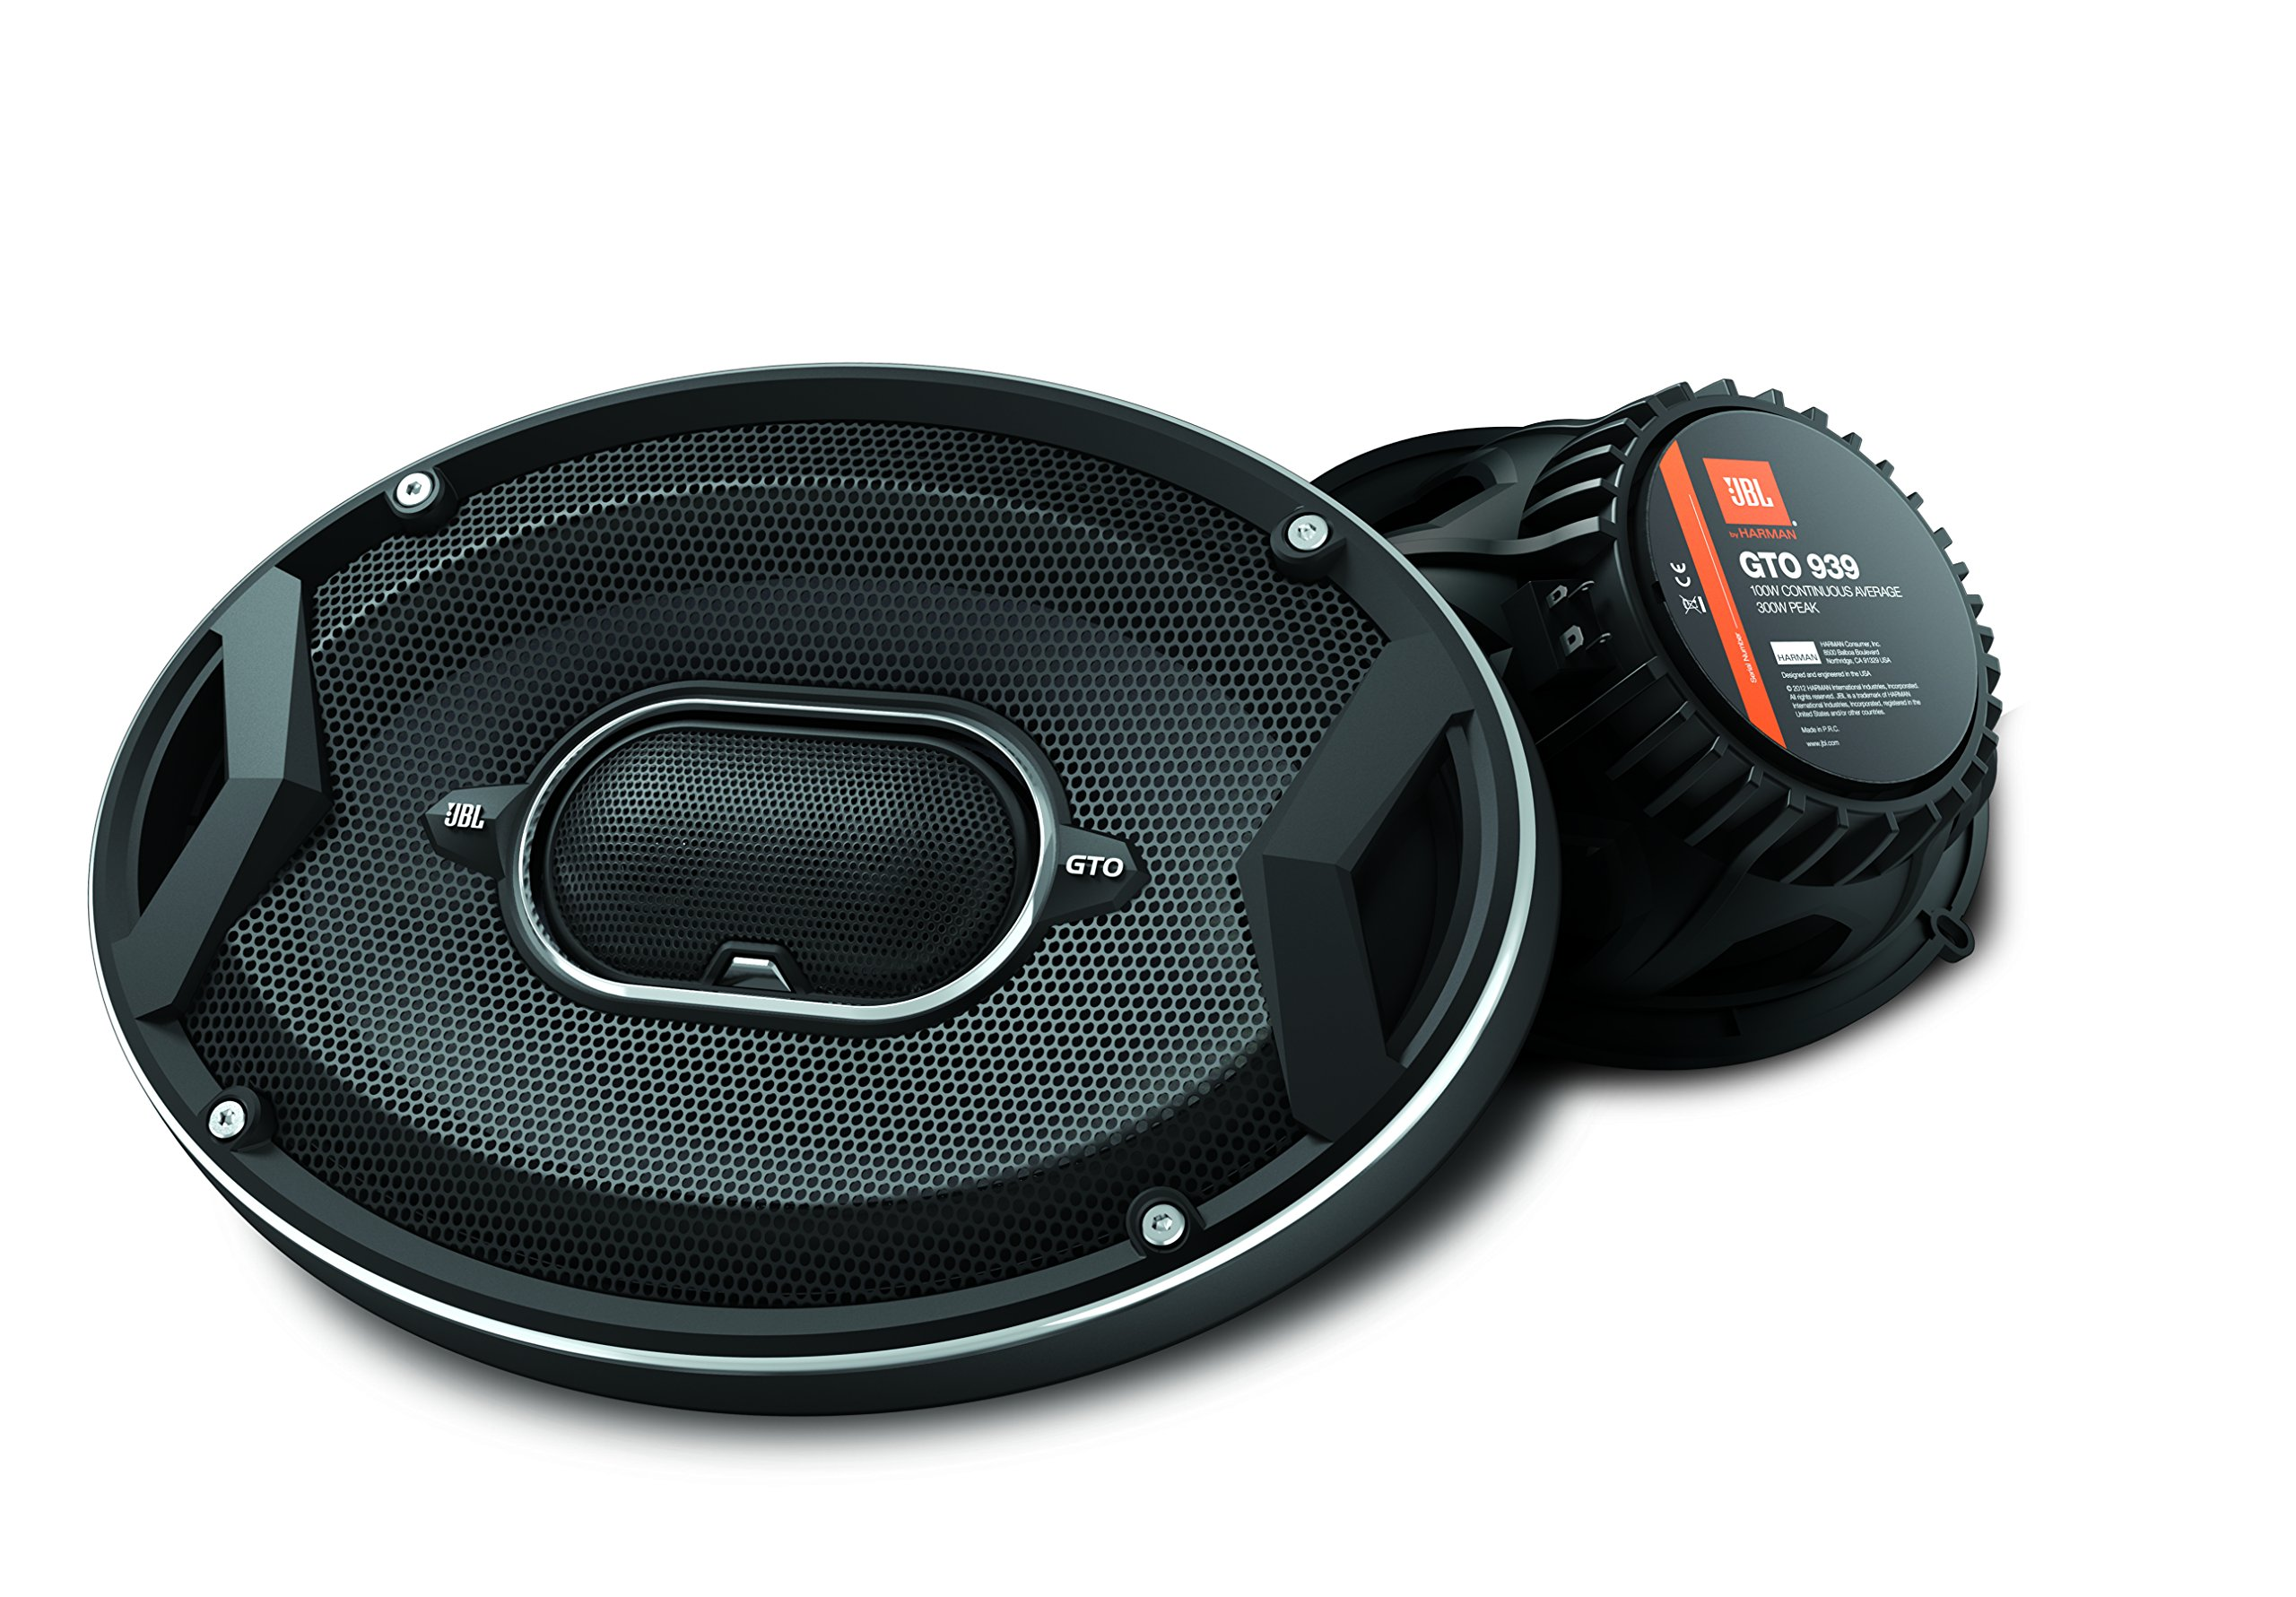 JBL GTO939 Premium Co Axial Speaker